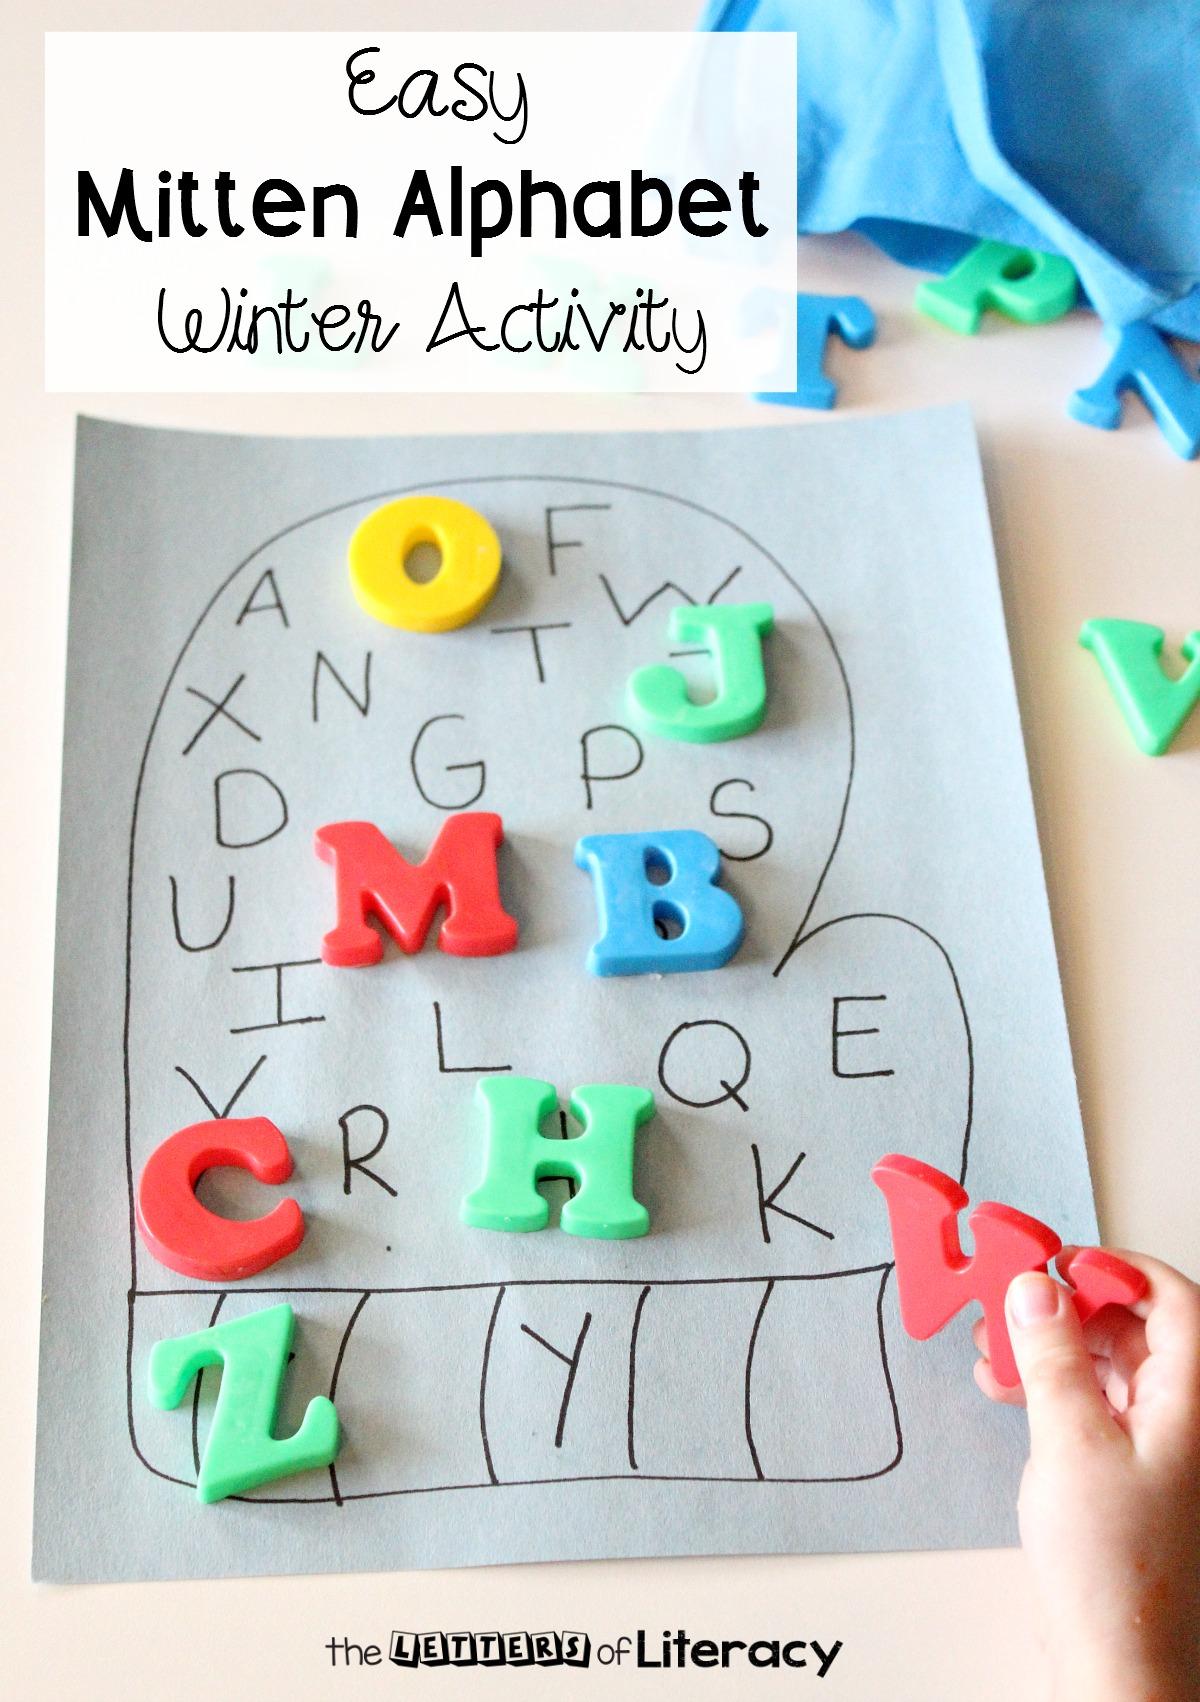 Easy Mitten Alphabet Winter Activity